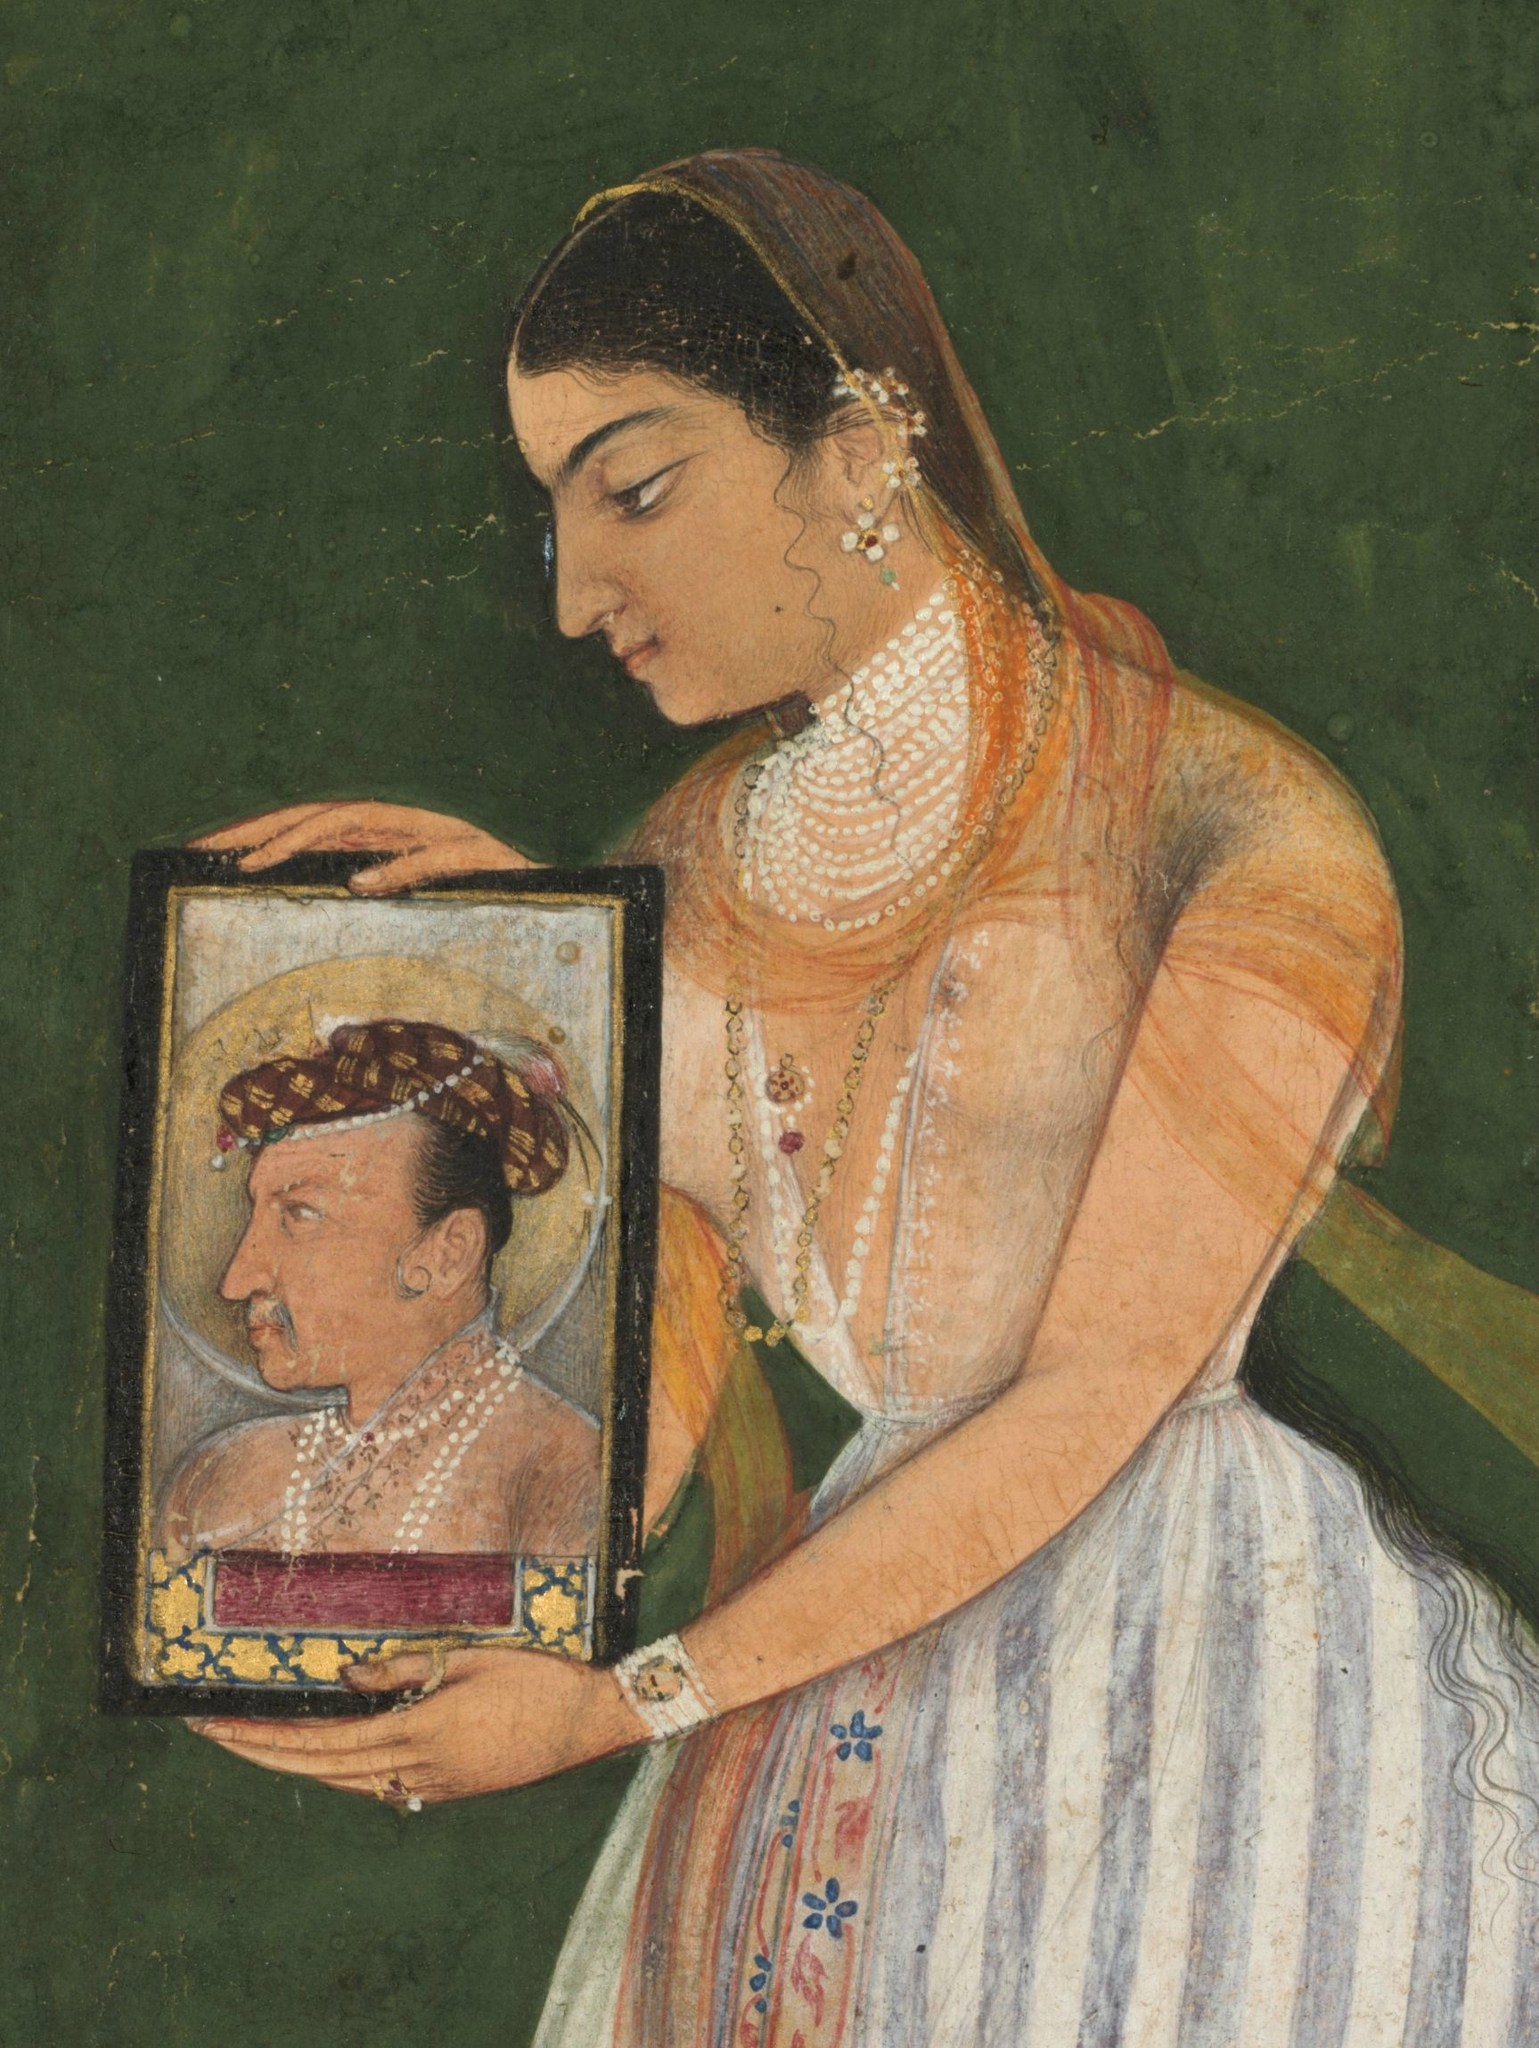 Nur_Jahan_holding_a_portrait_of_Emperor_Jahangir,_about_1627.jpg